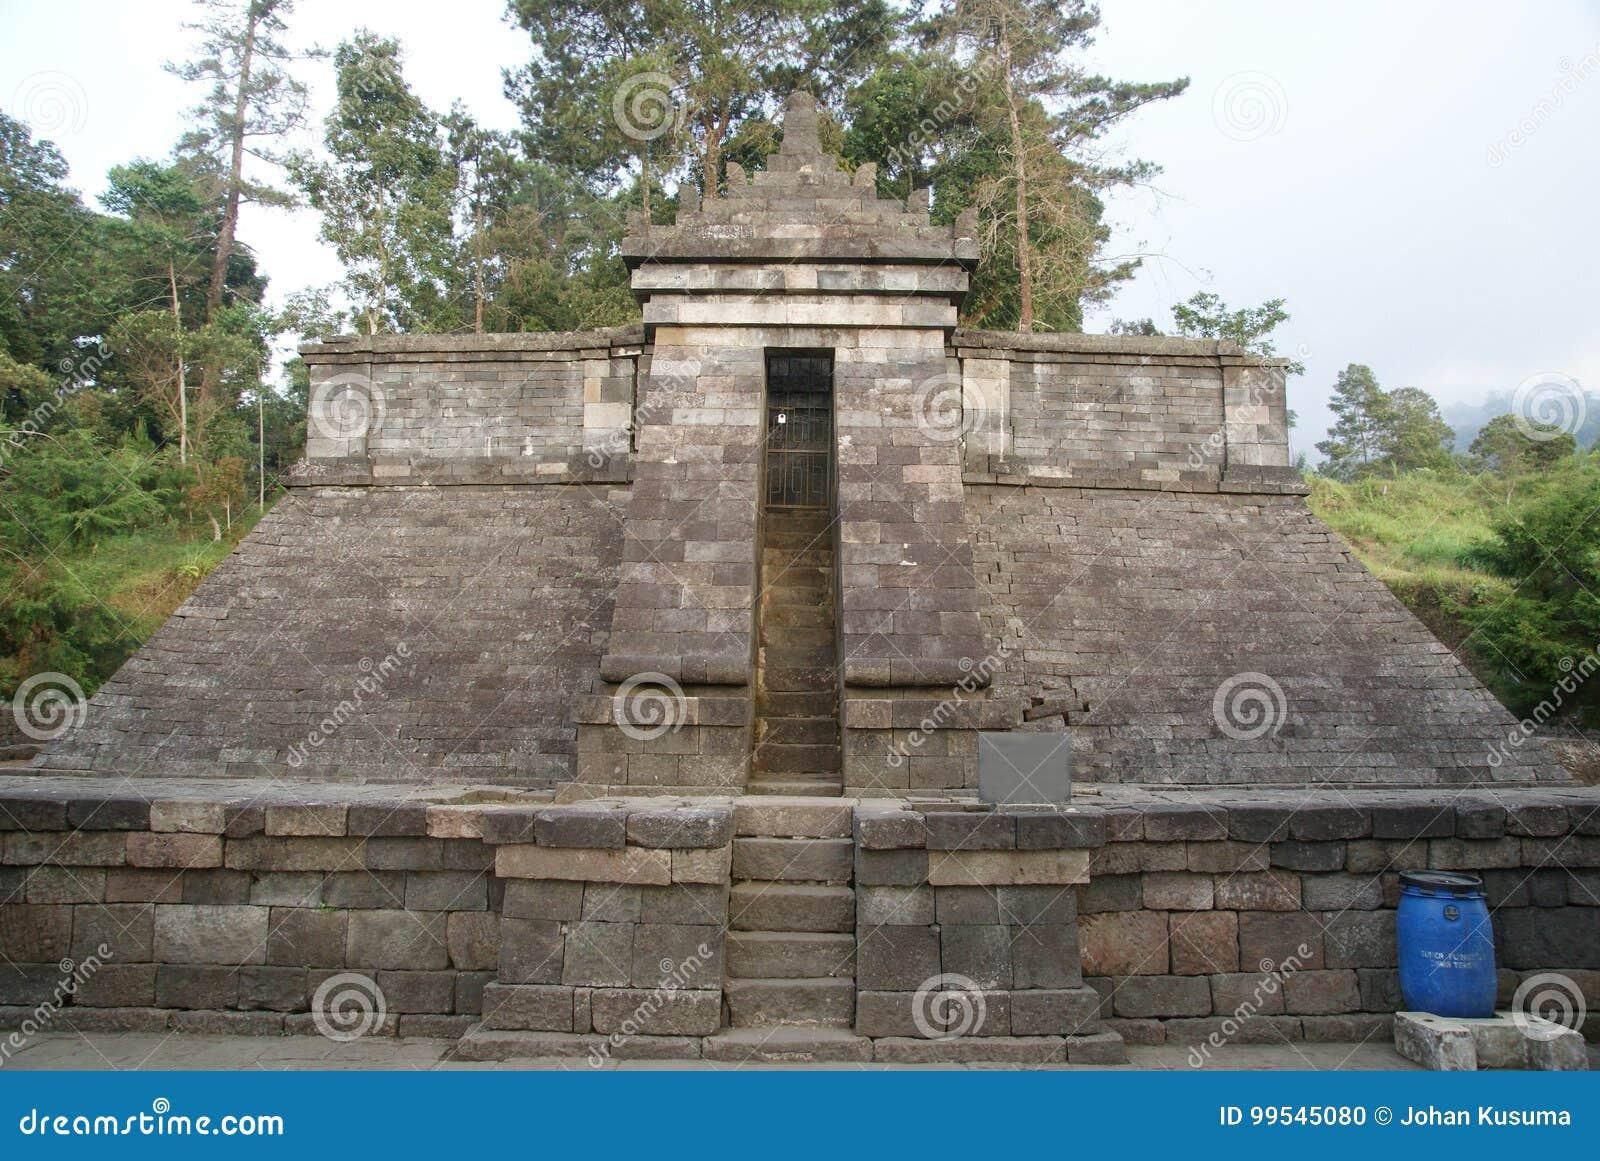 Cetho Temple Candi Cetho Located In Karanganyar Java Indonesia